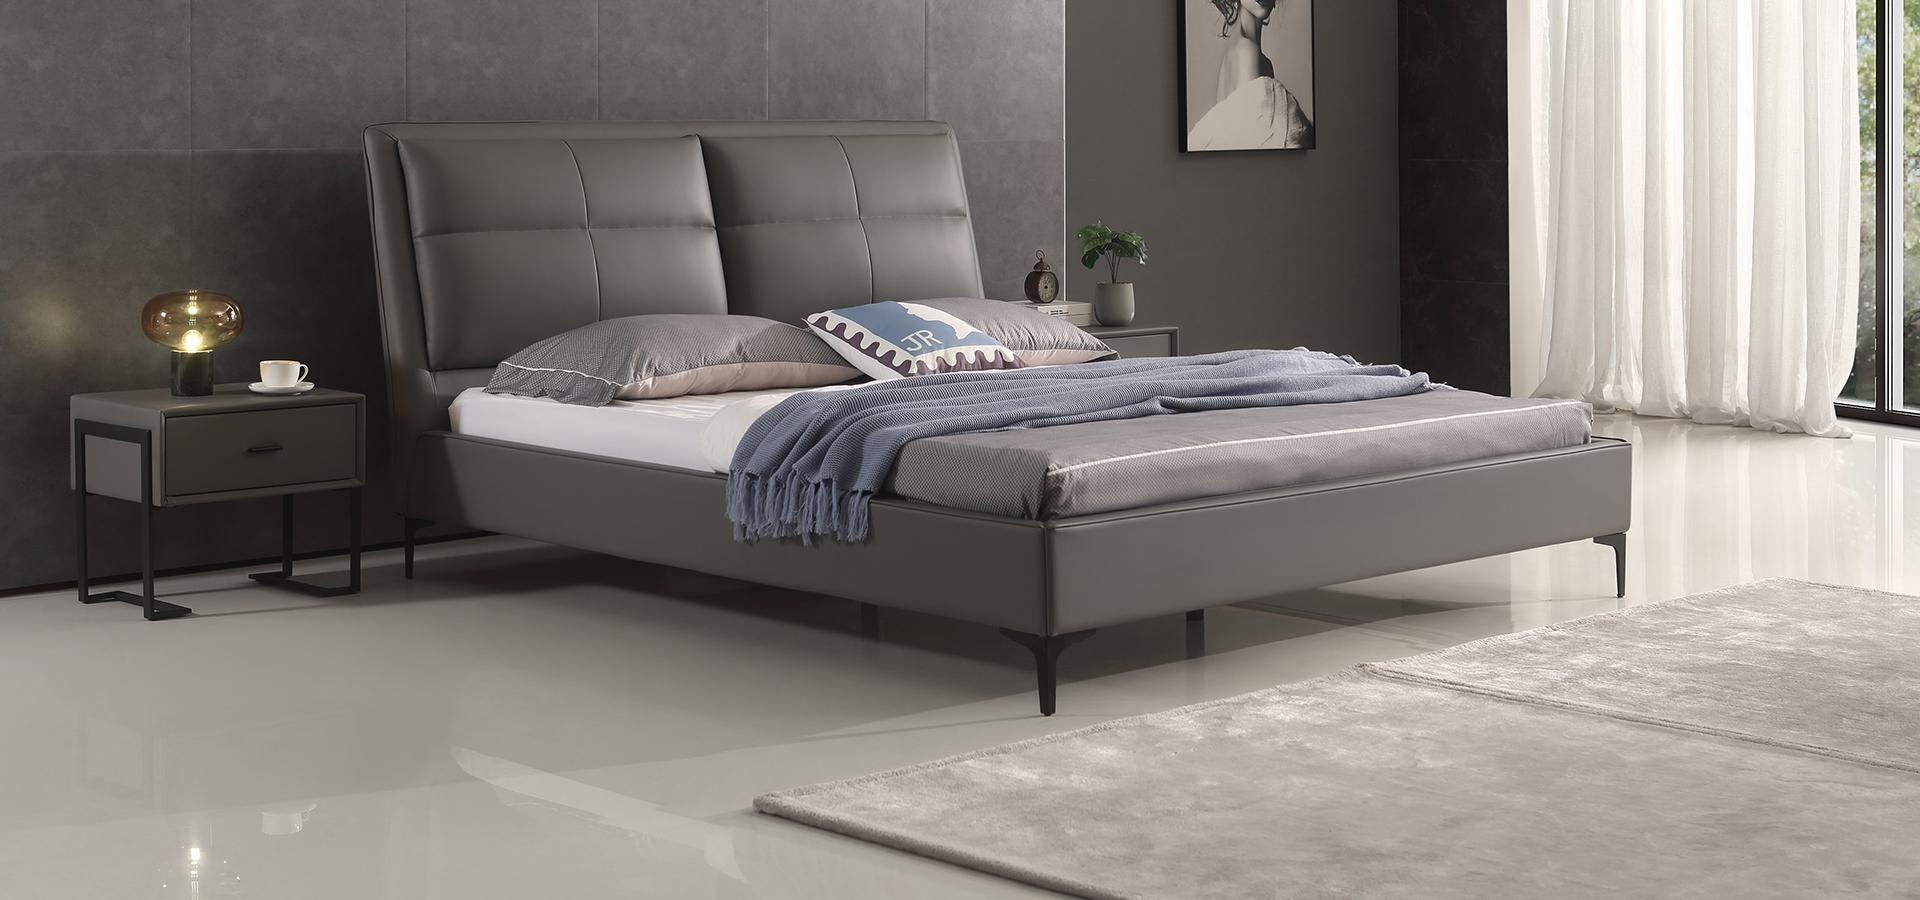 electric adjustable bed OEM from golden furniture